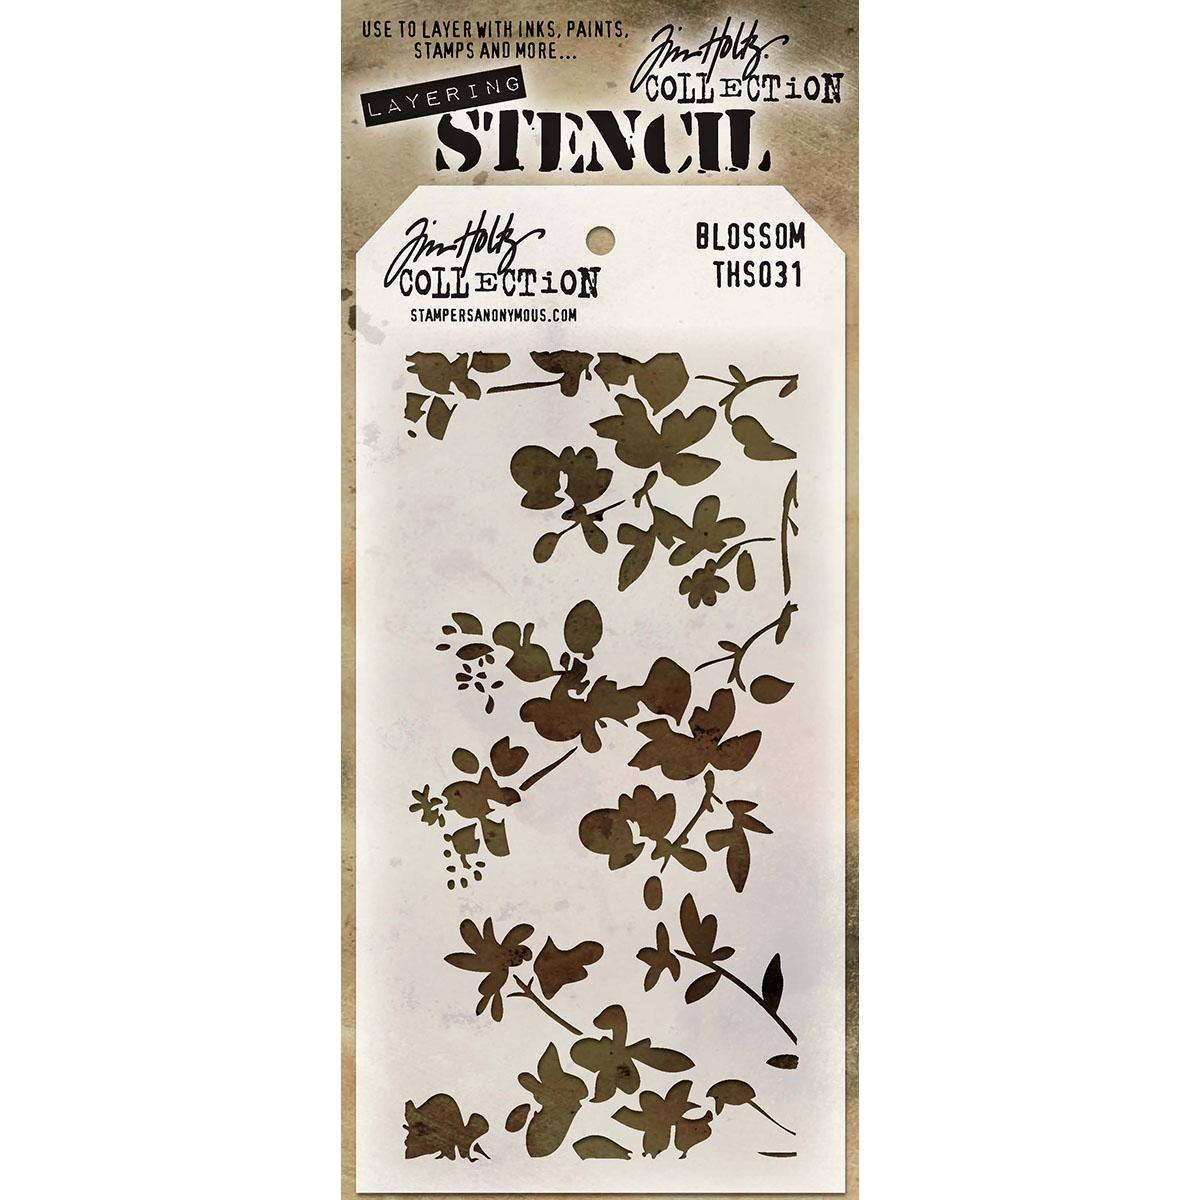 Tim Holtz Layered Stencil 4.125X8.5-Blossom